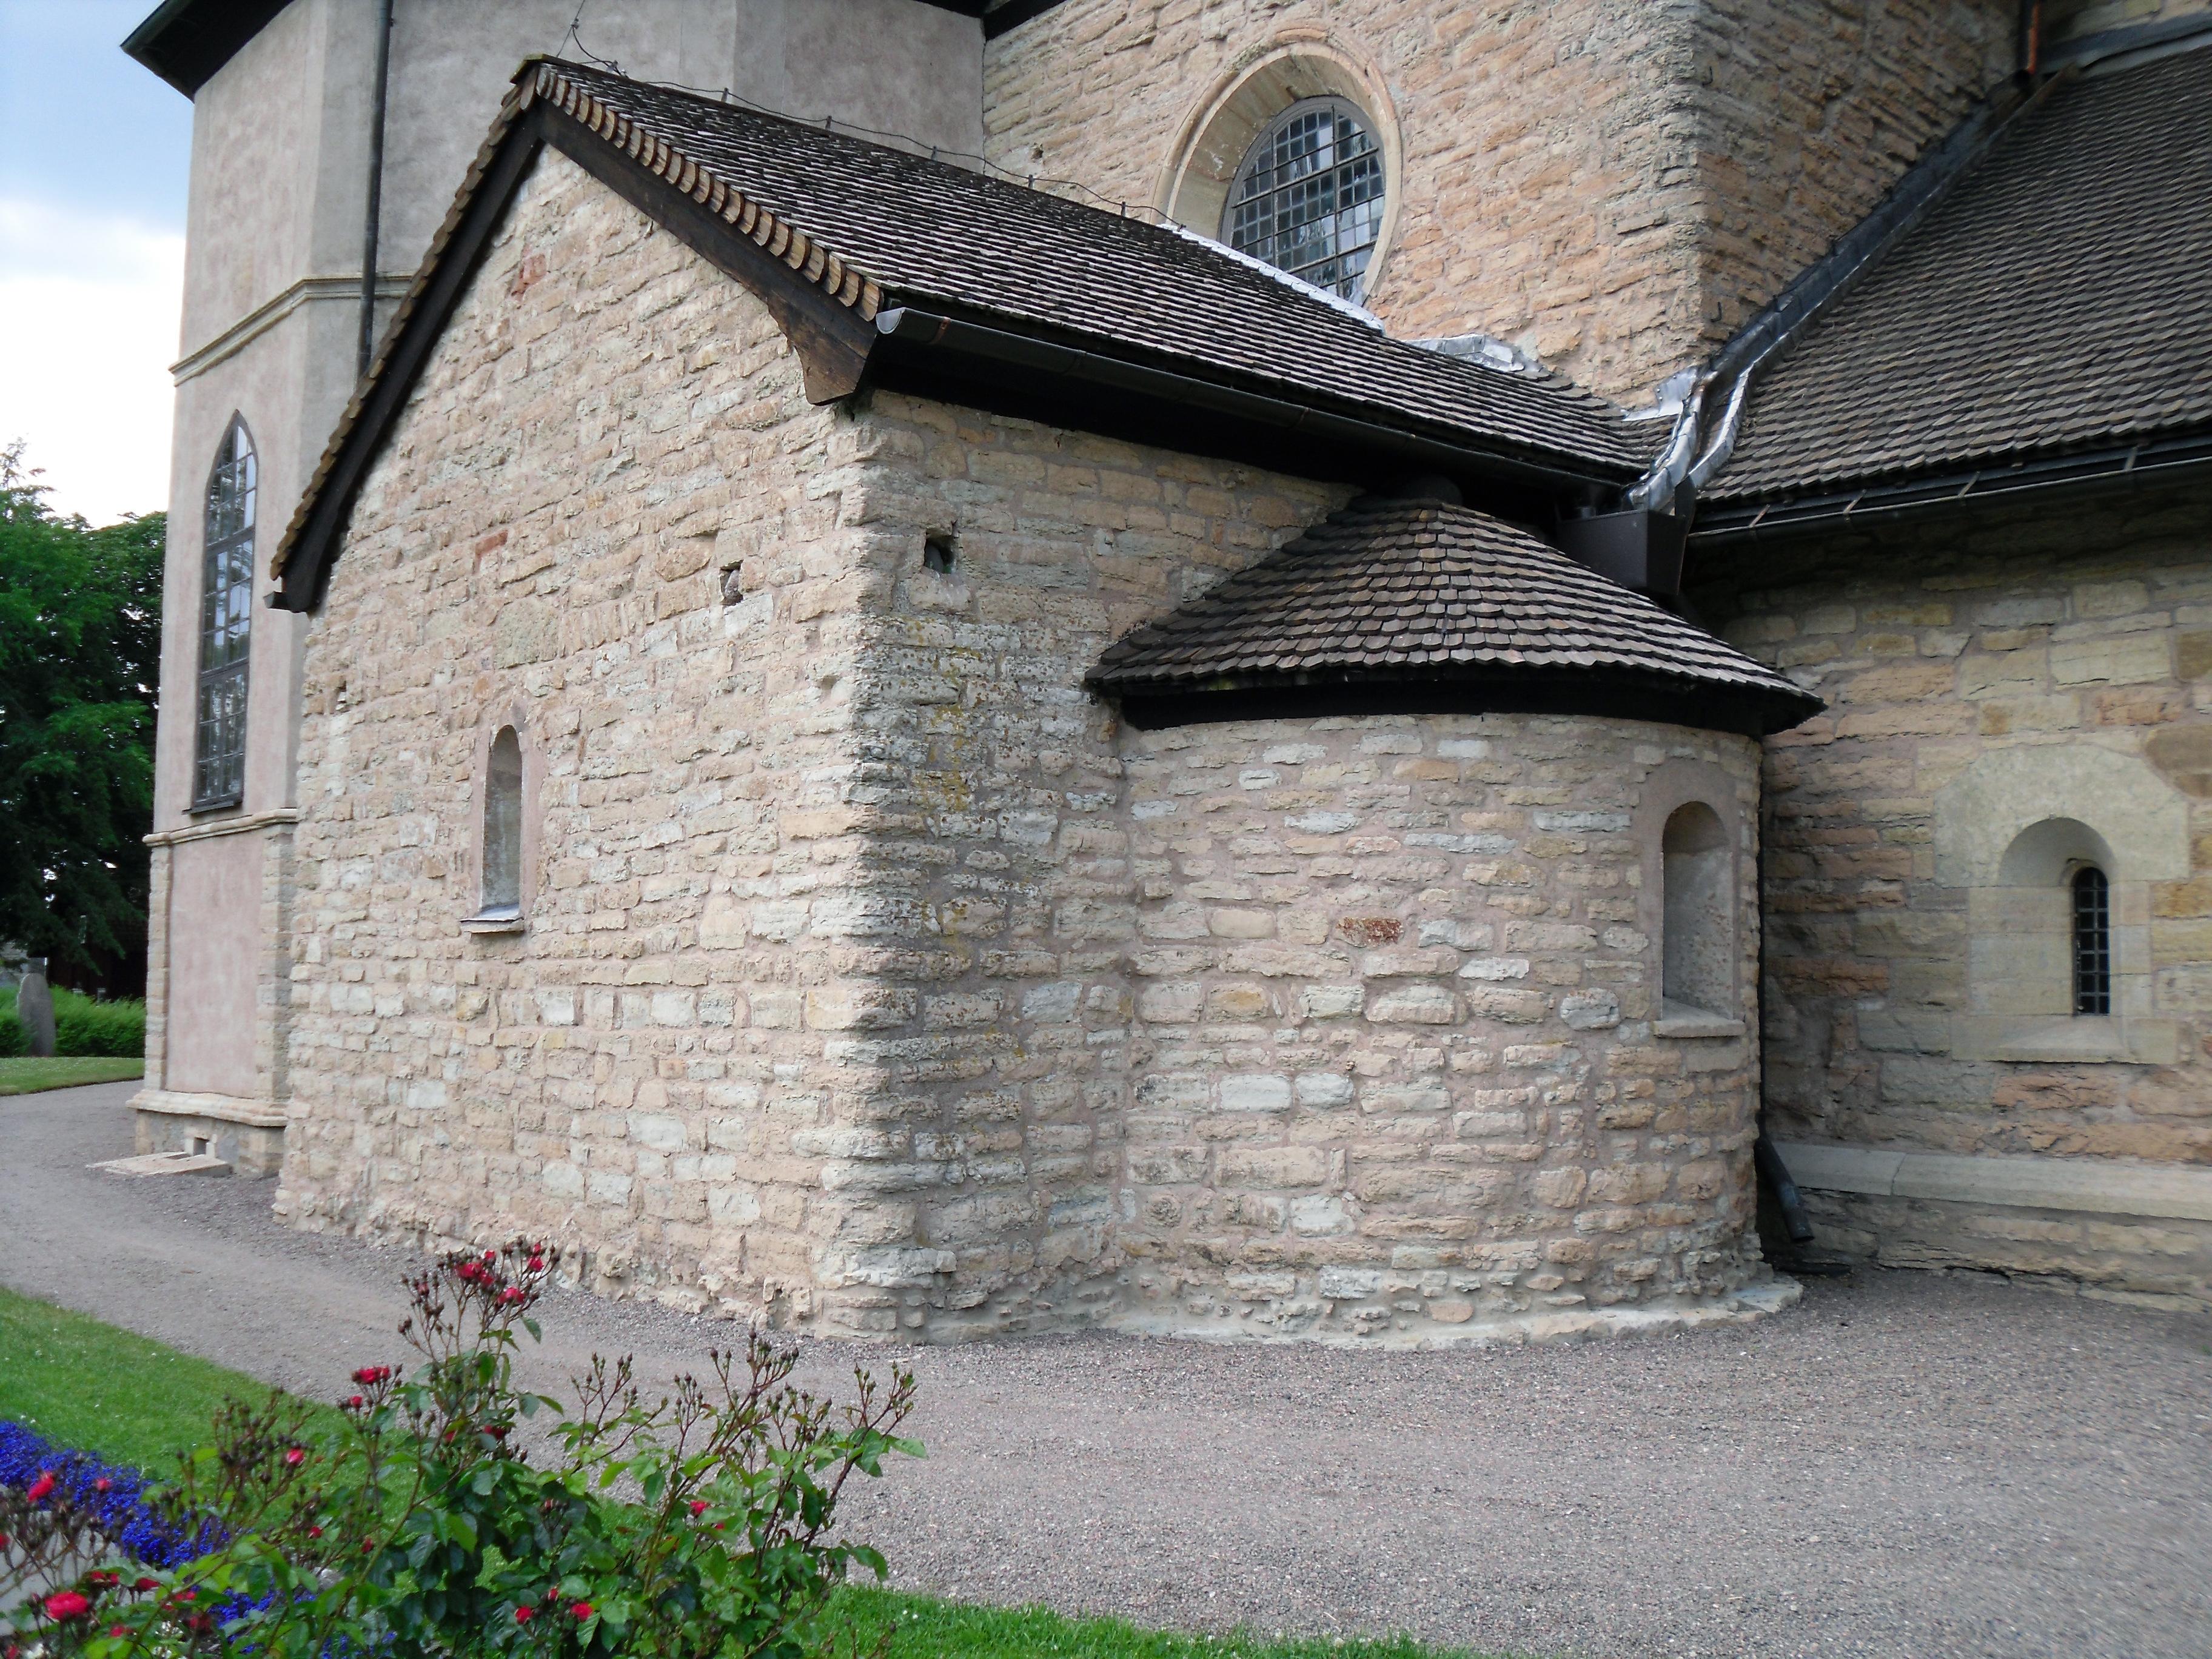 vreta kloster dejting